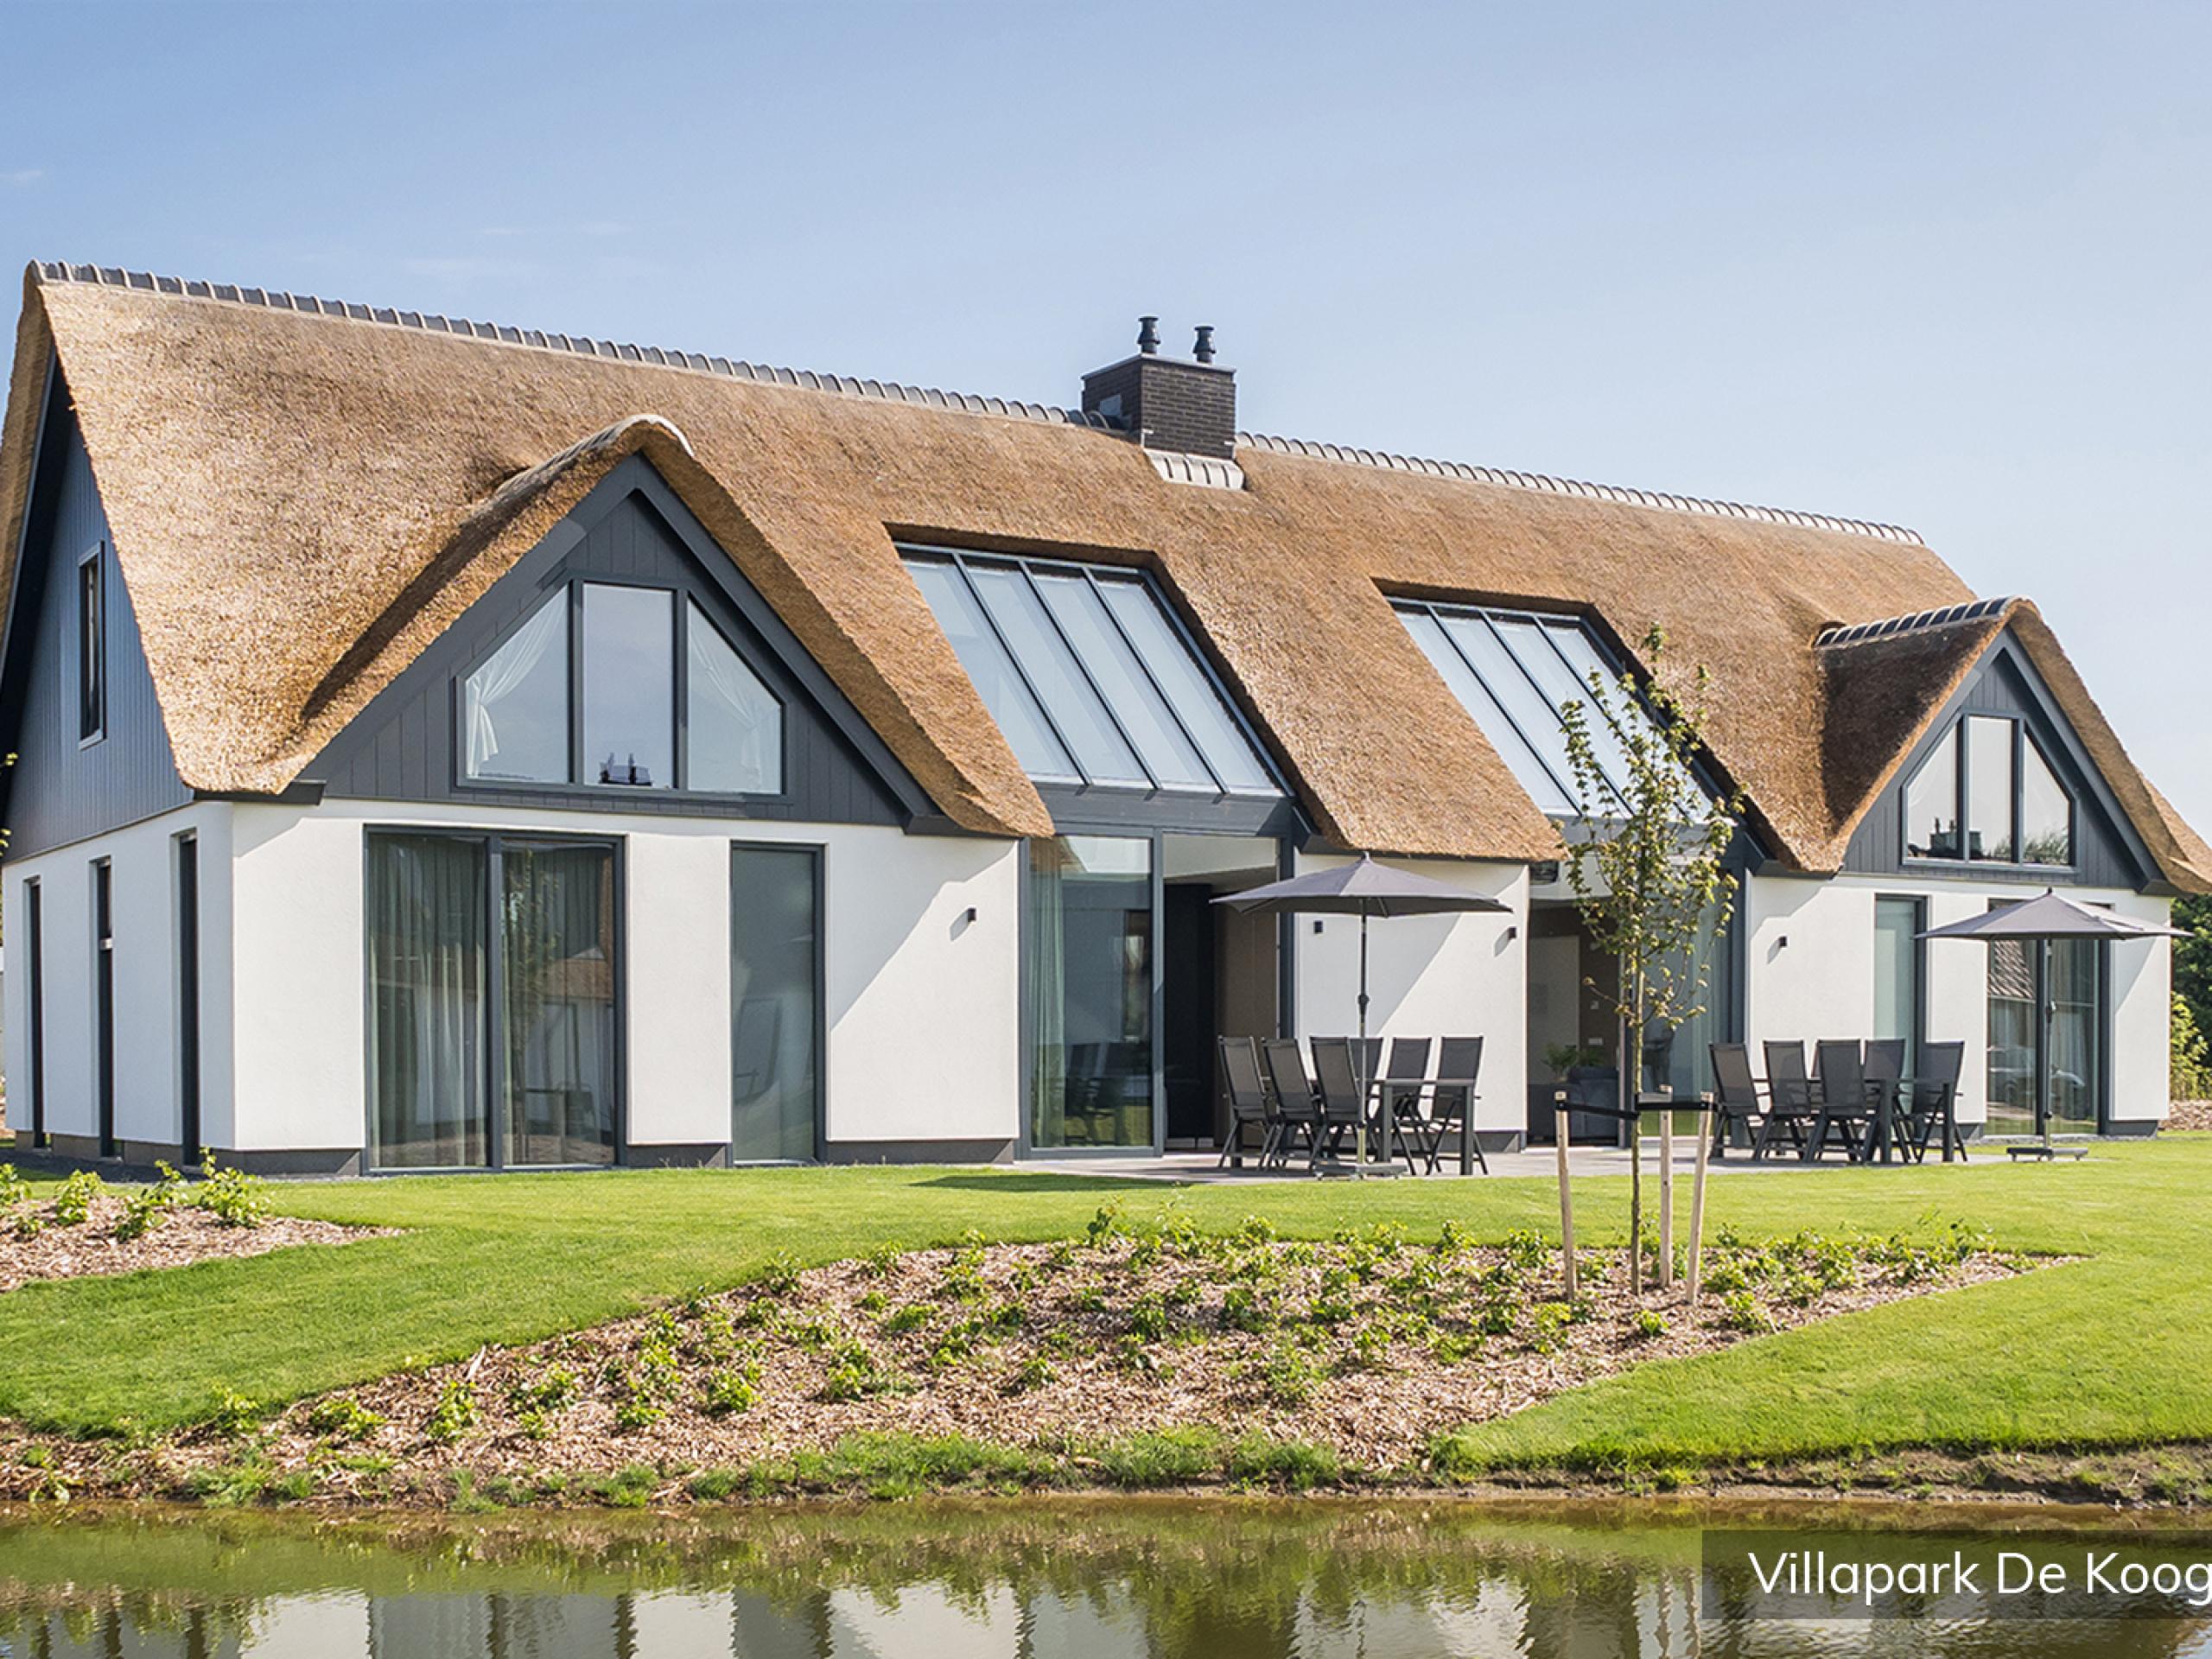 Luxuriöse Familienvilla für 12 Personen am Villenpark in De Koog